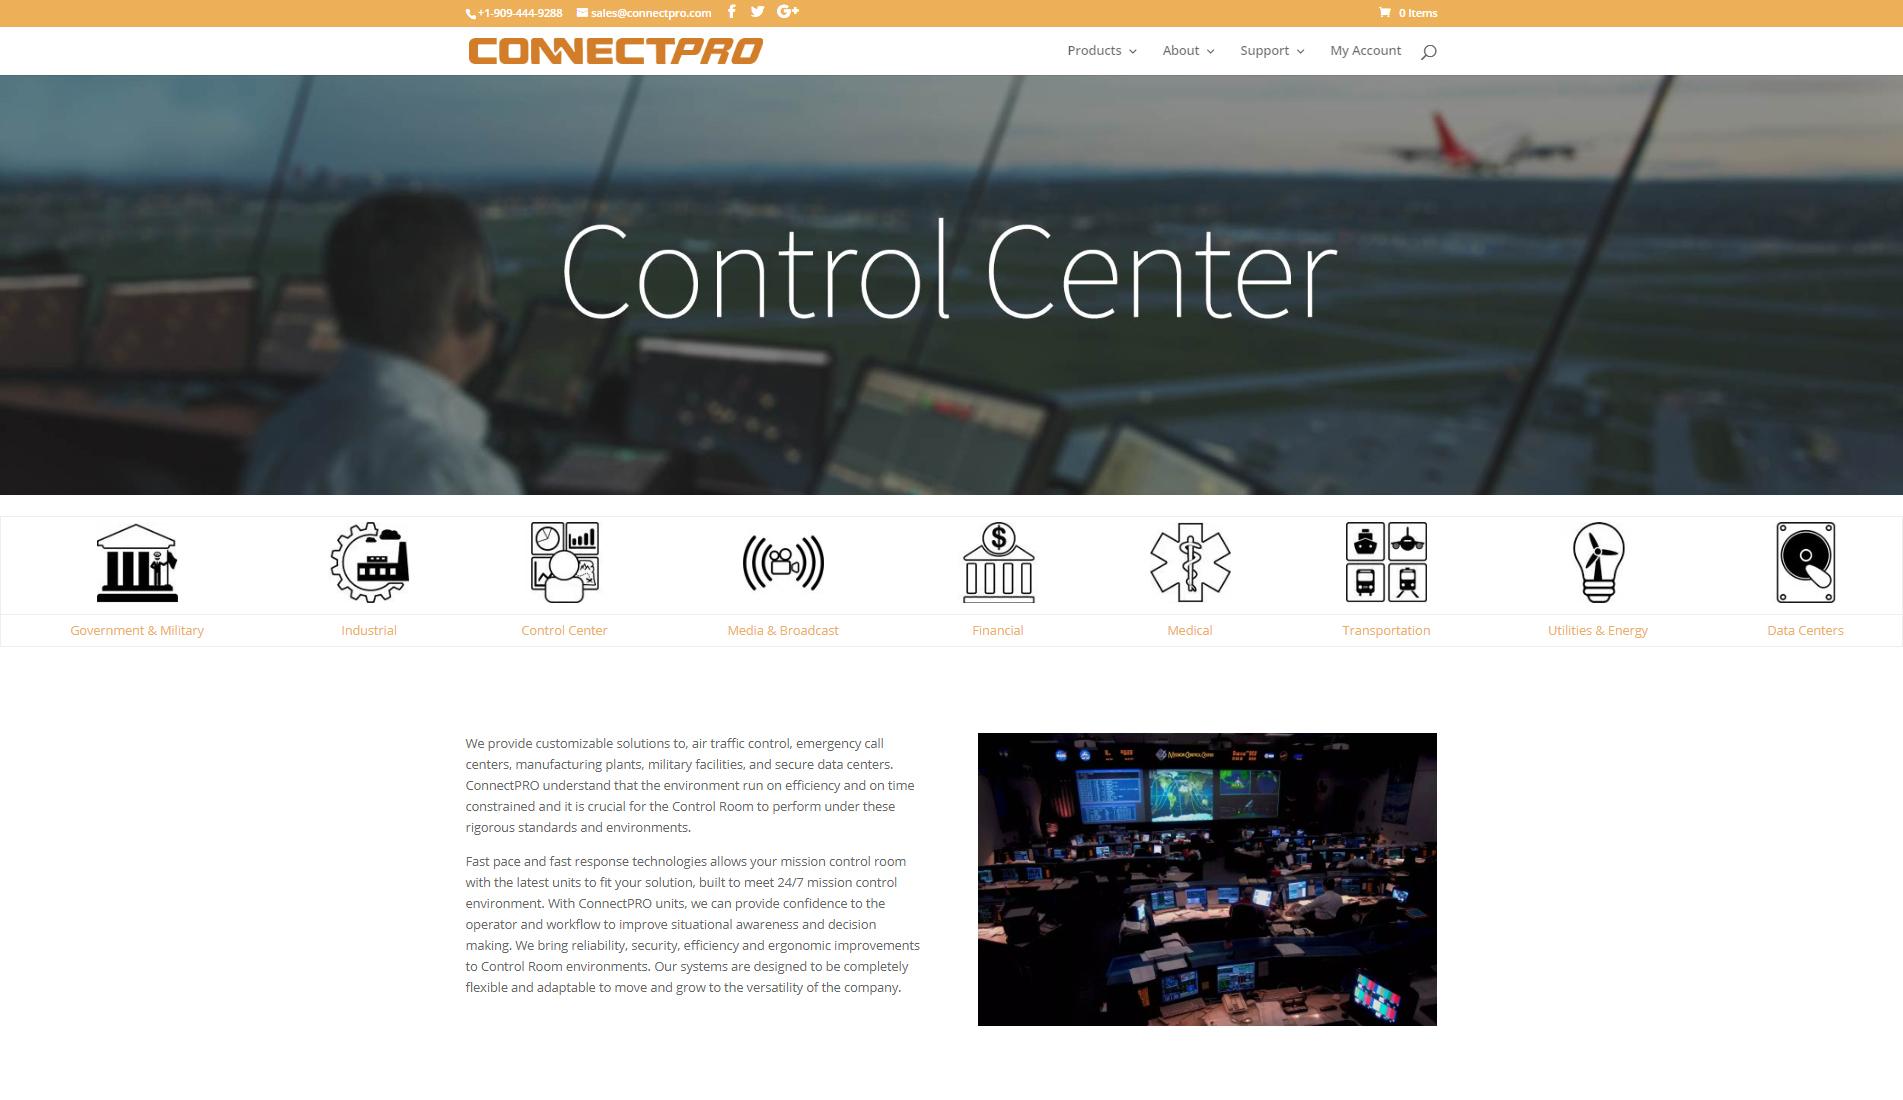 ConnectPRO_Industry_Nav_Bar_Control_Center.jpg